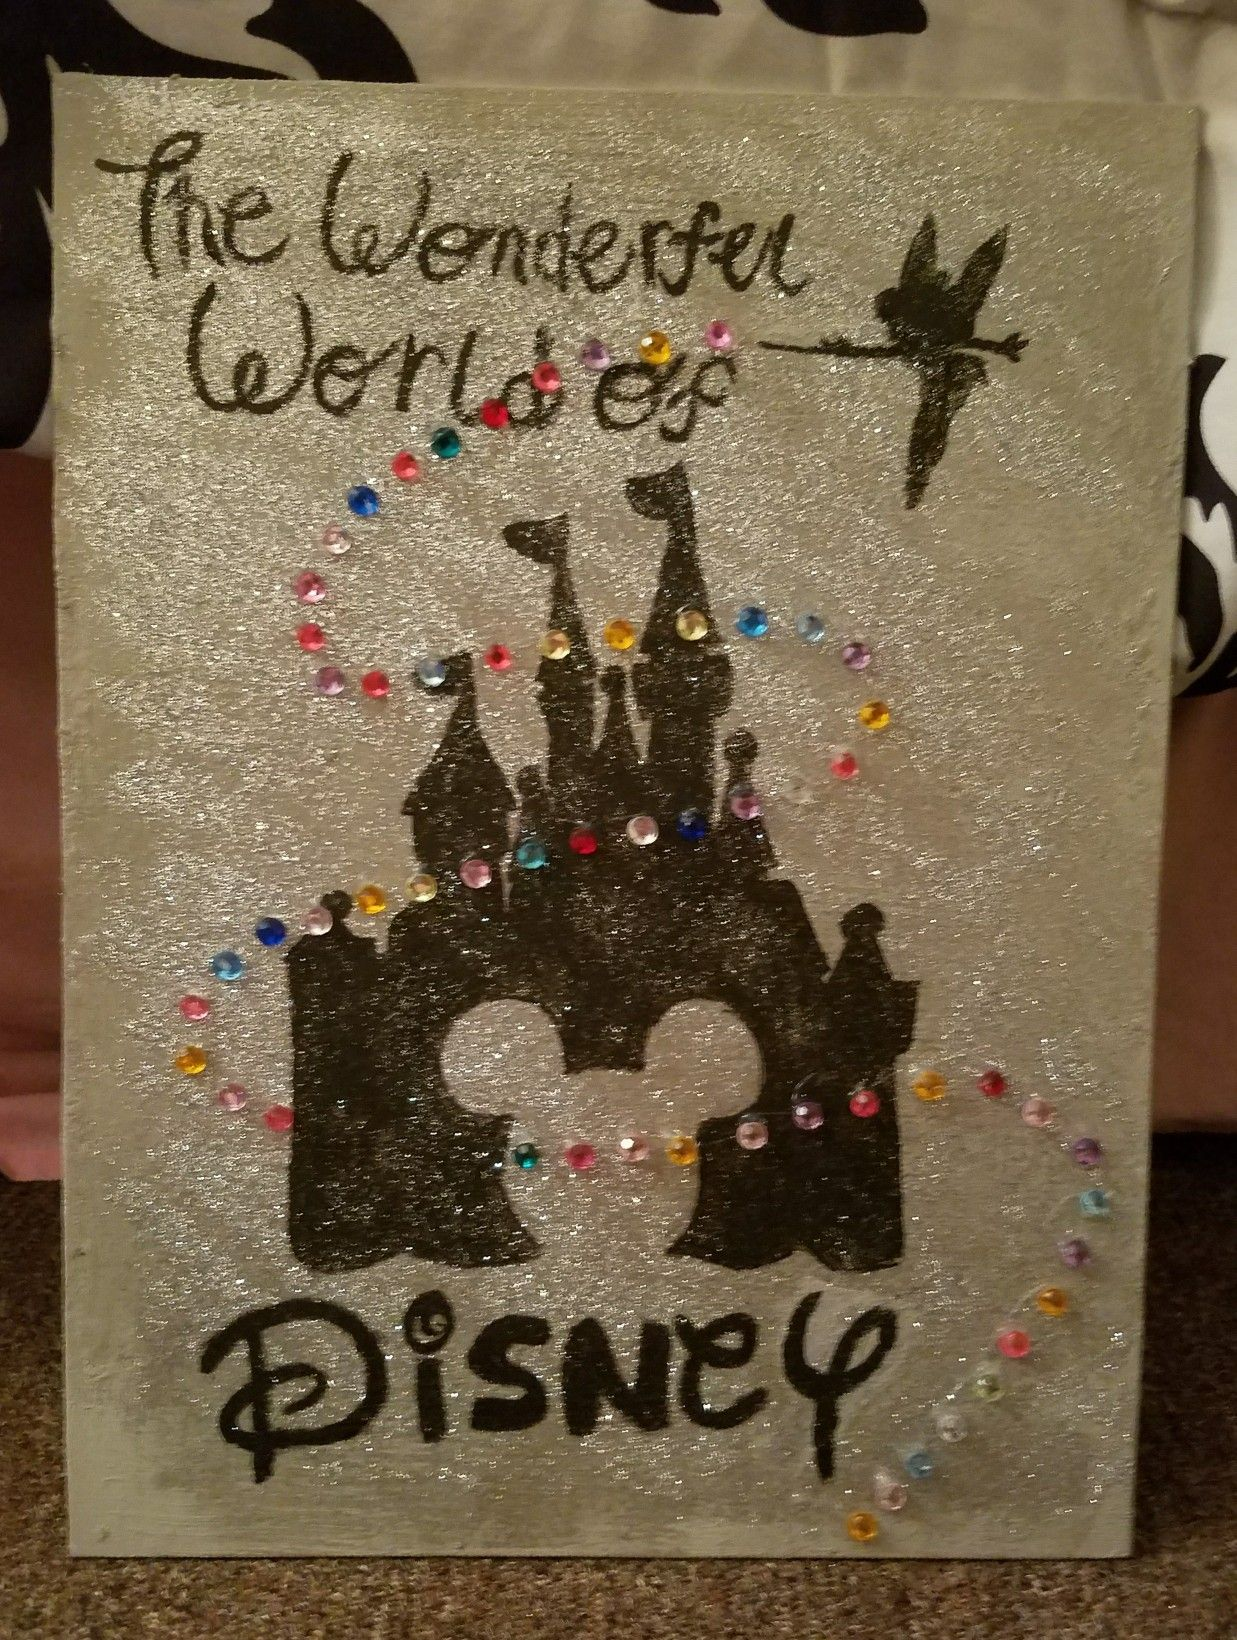 Disney Castle Canvas The Wonderful World Of Crafts Easy Diy Painting Glitter Gems